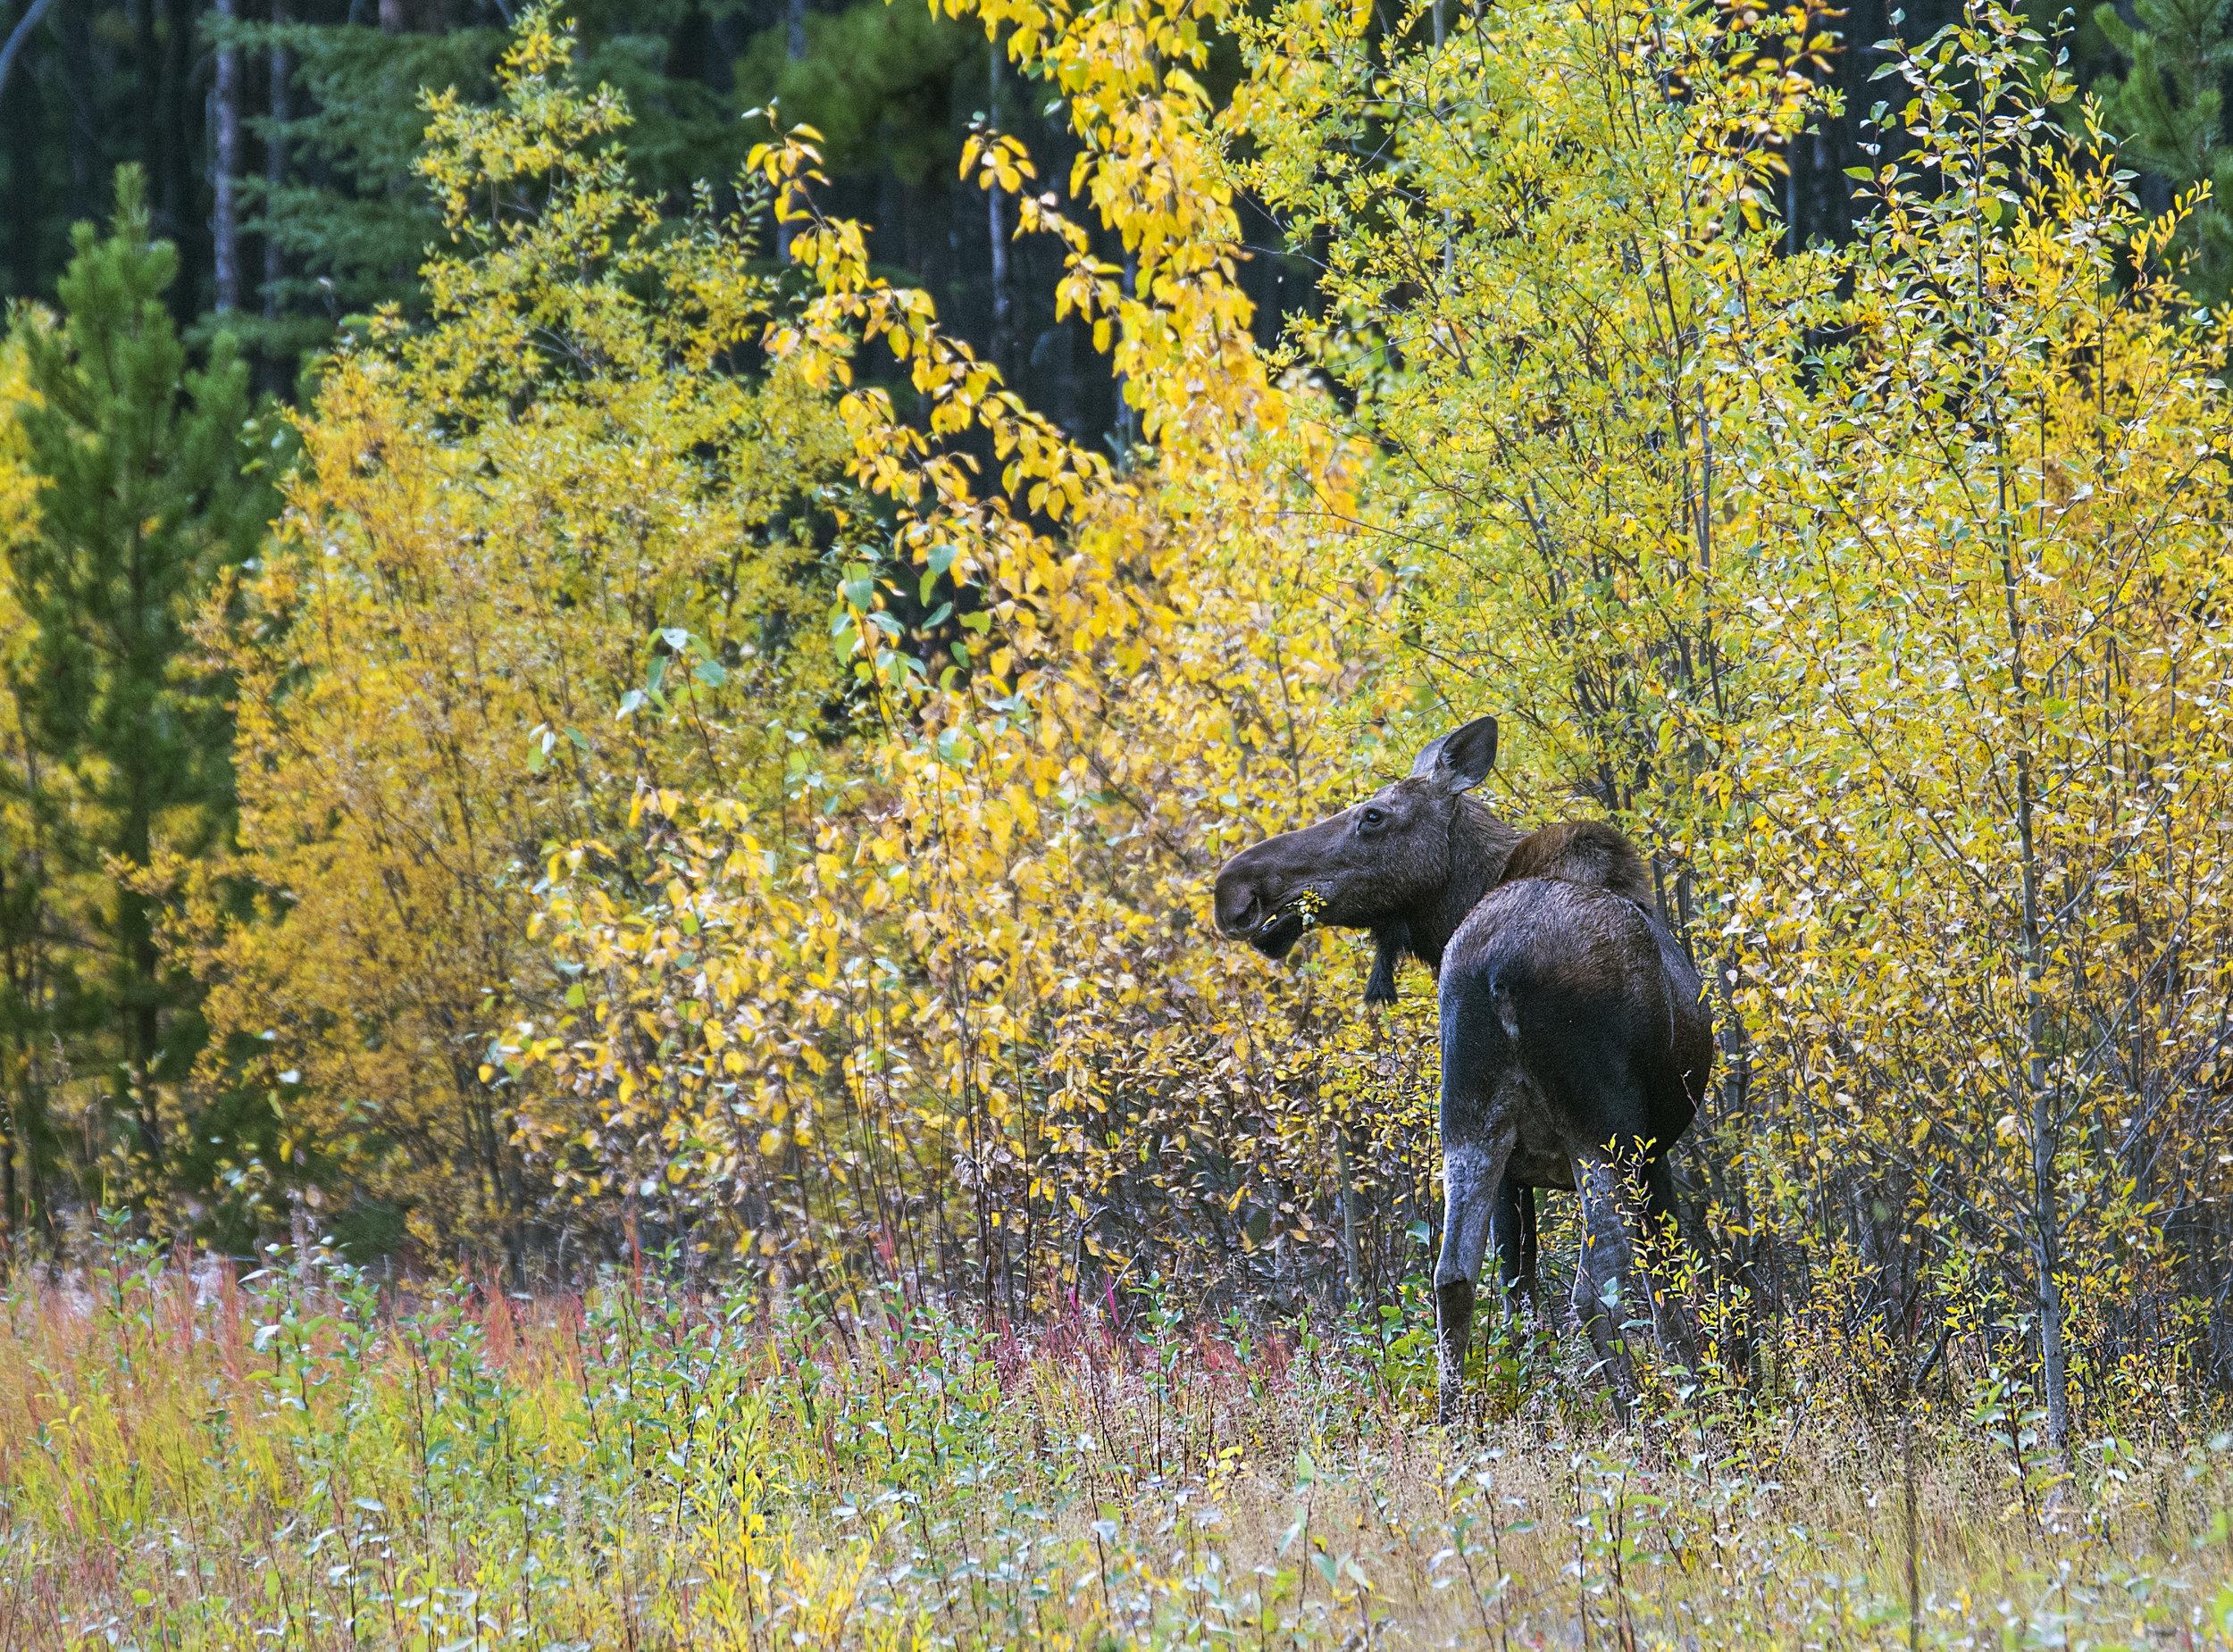 Moose eating dinner bc .jpg